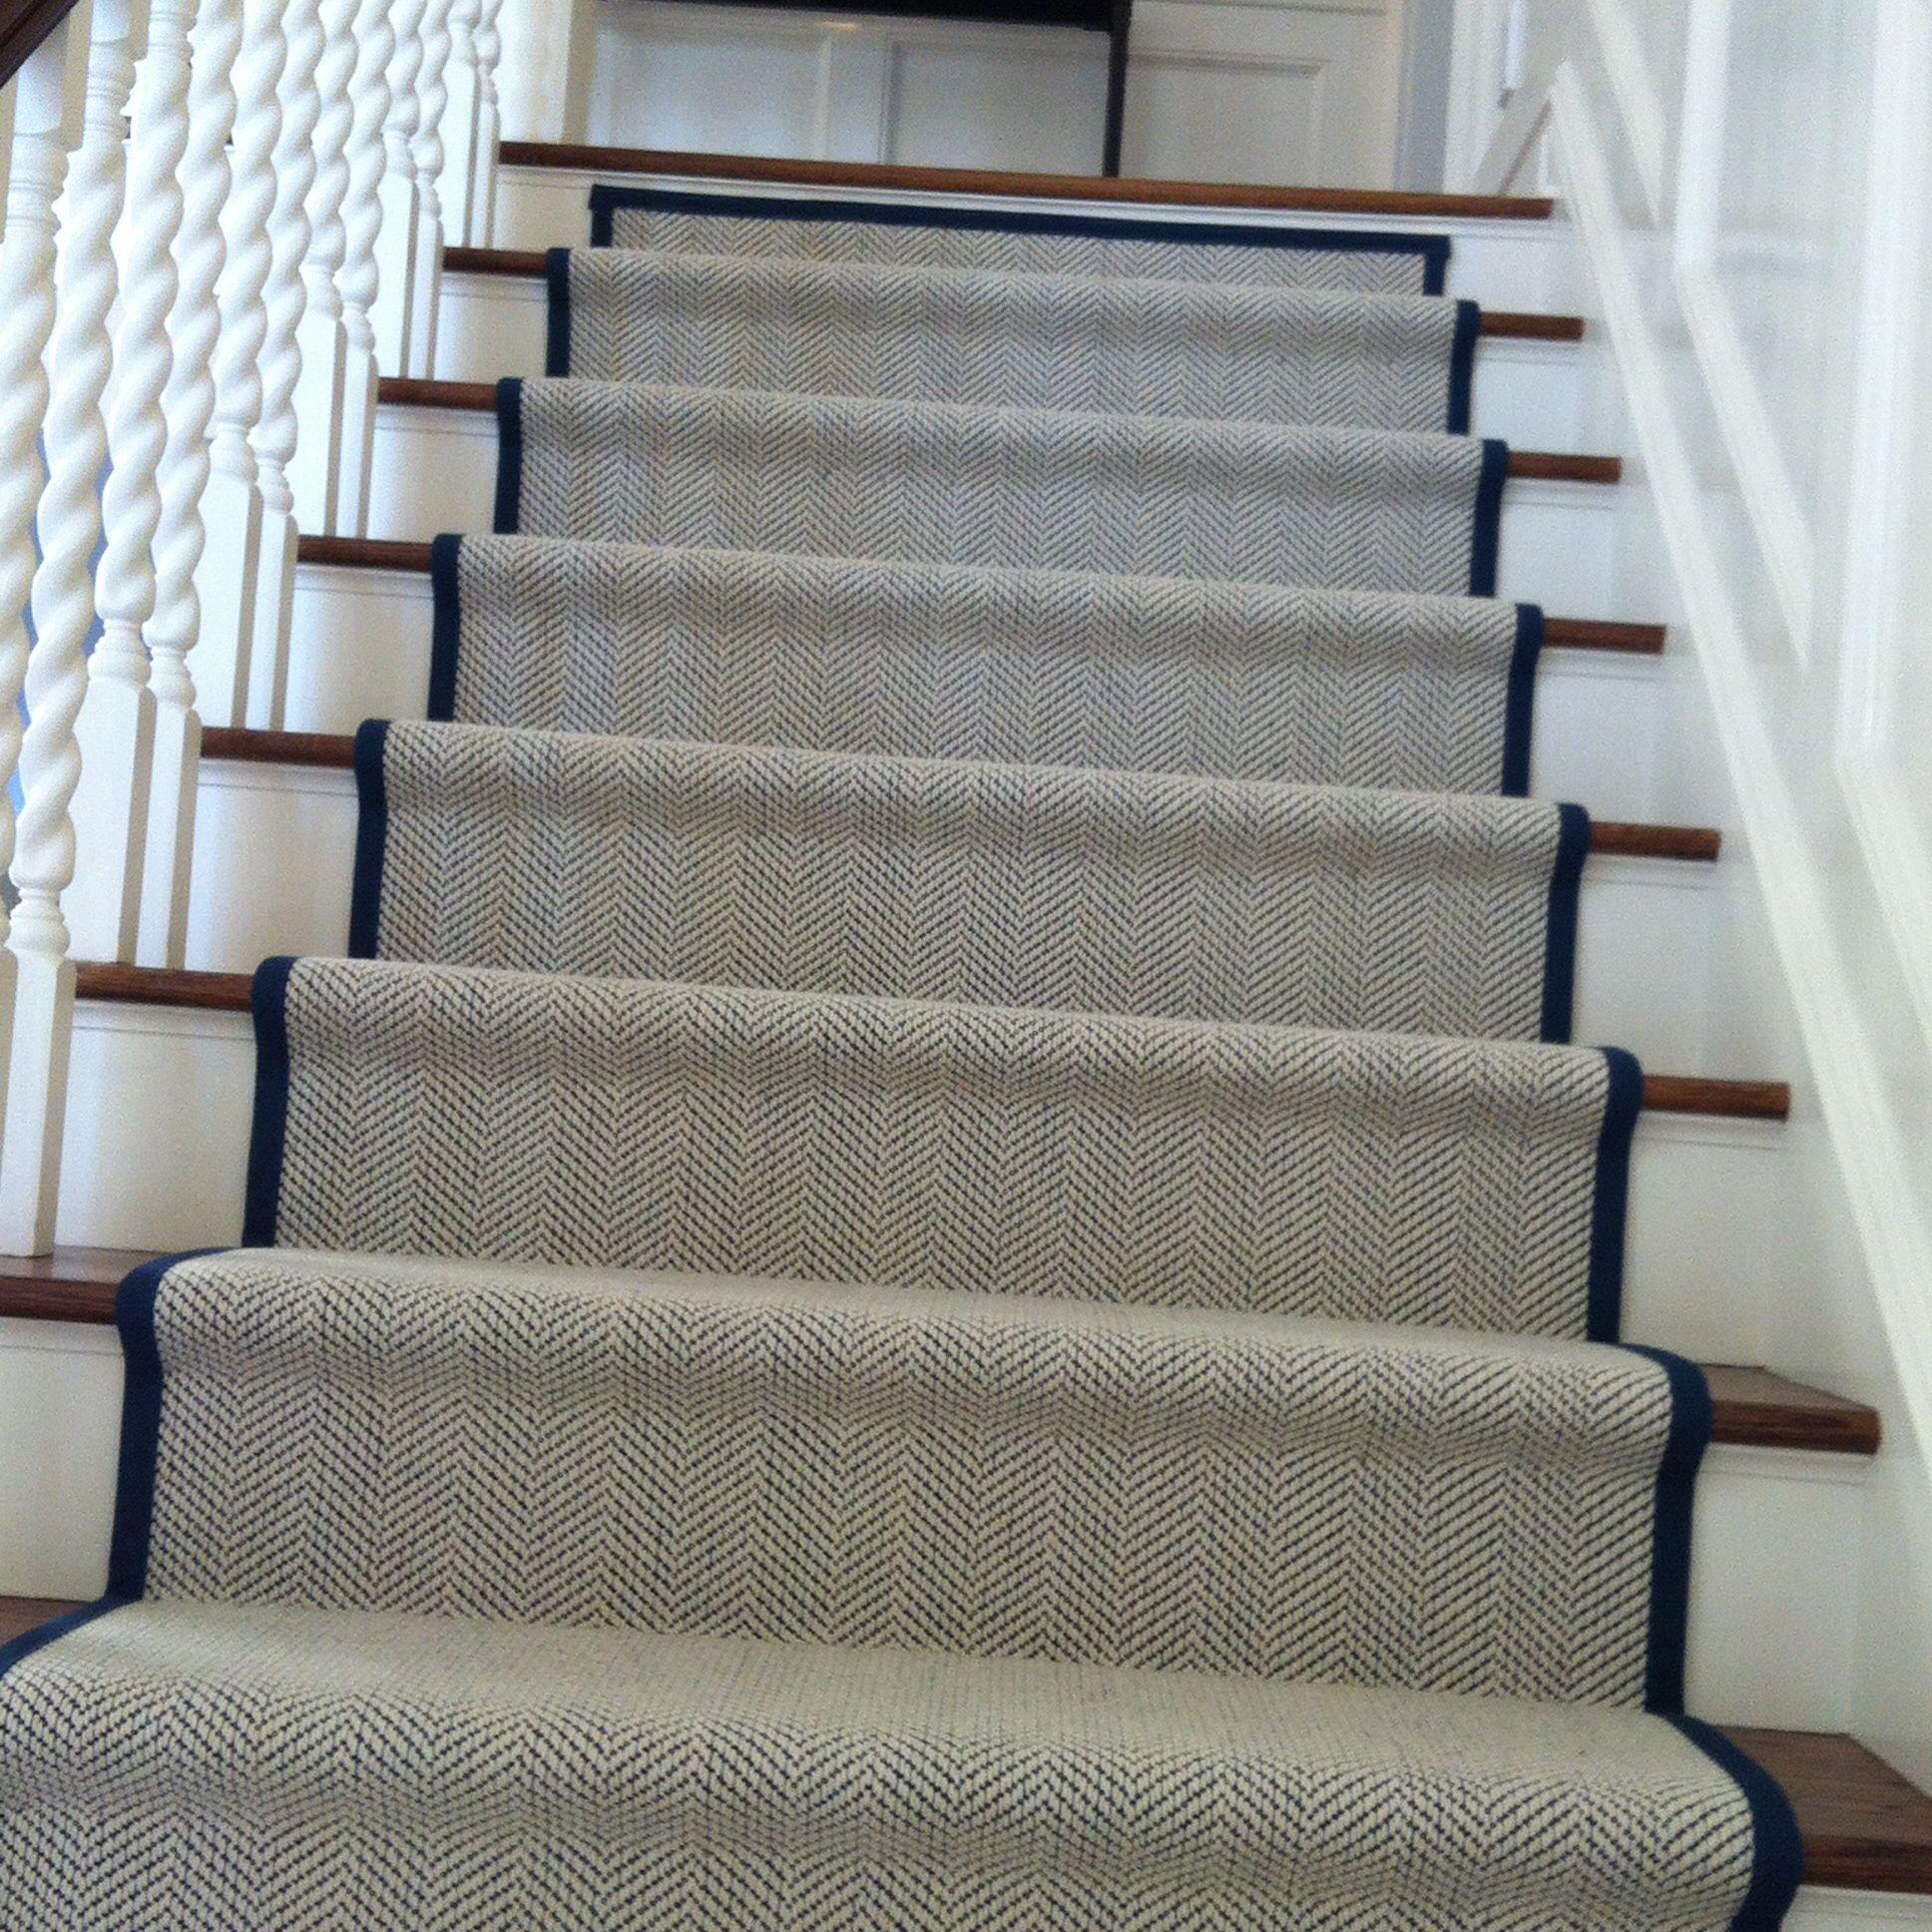 My New Staircase Runner Herringbone With A Marine Blue Binding